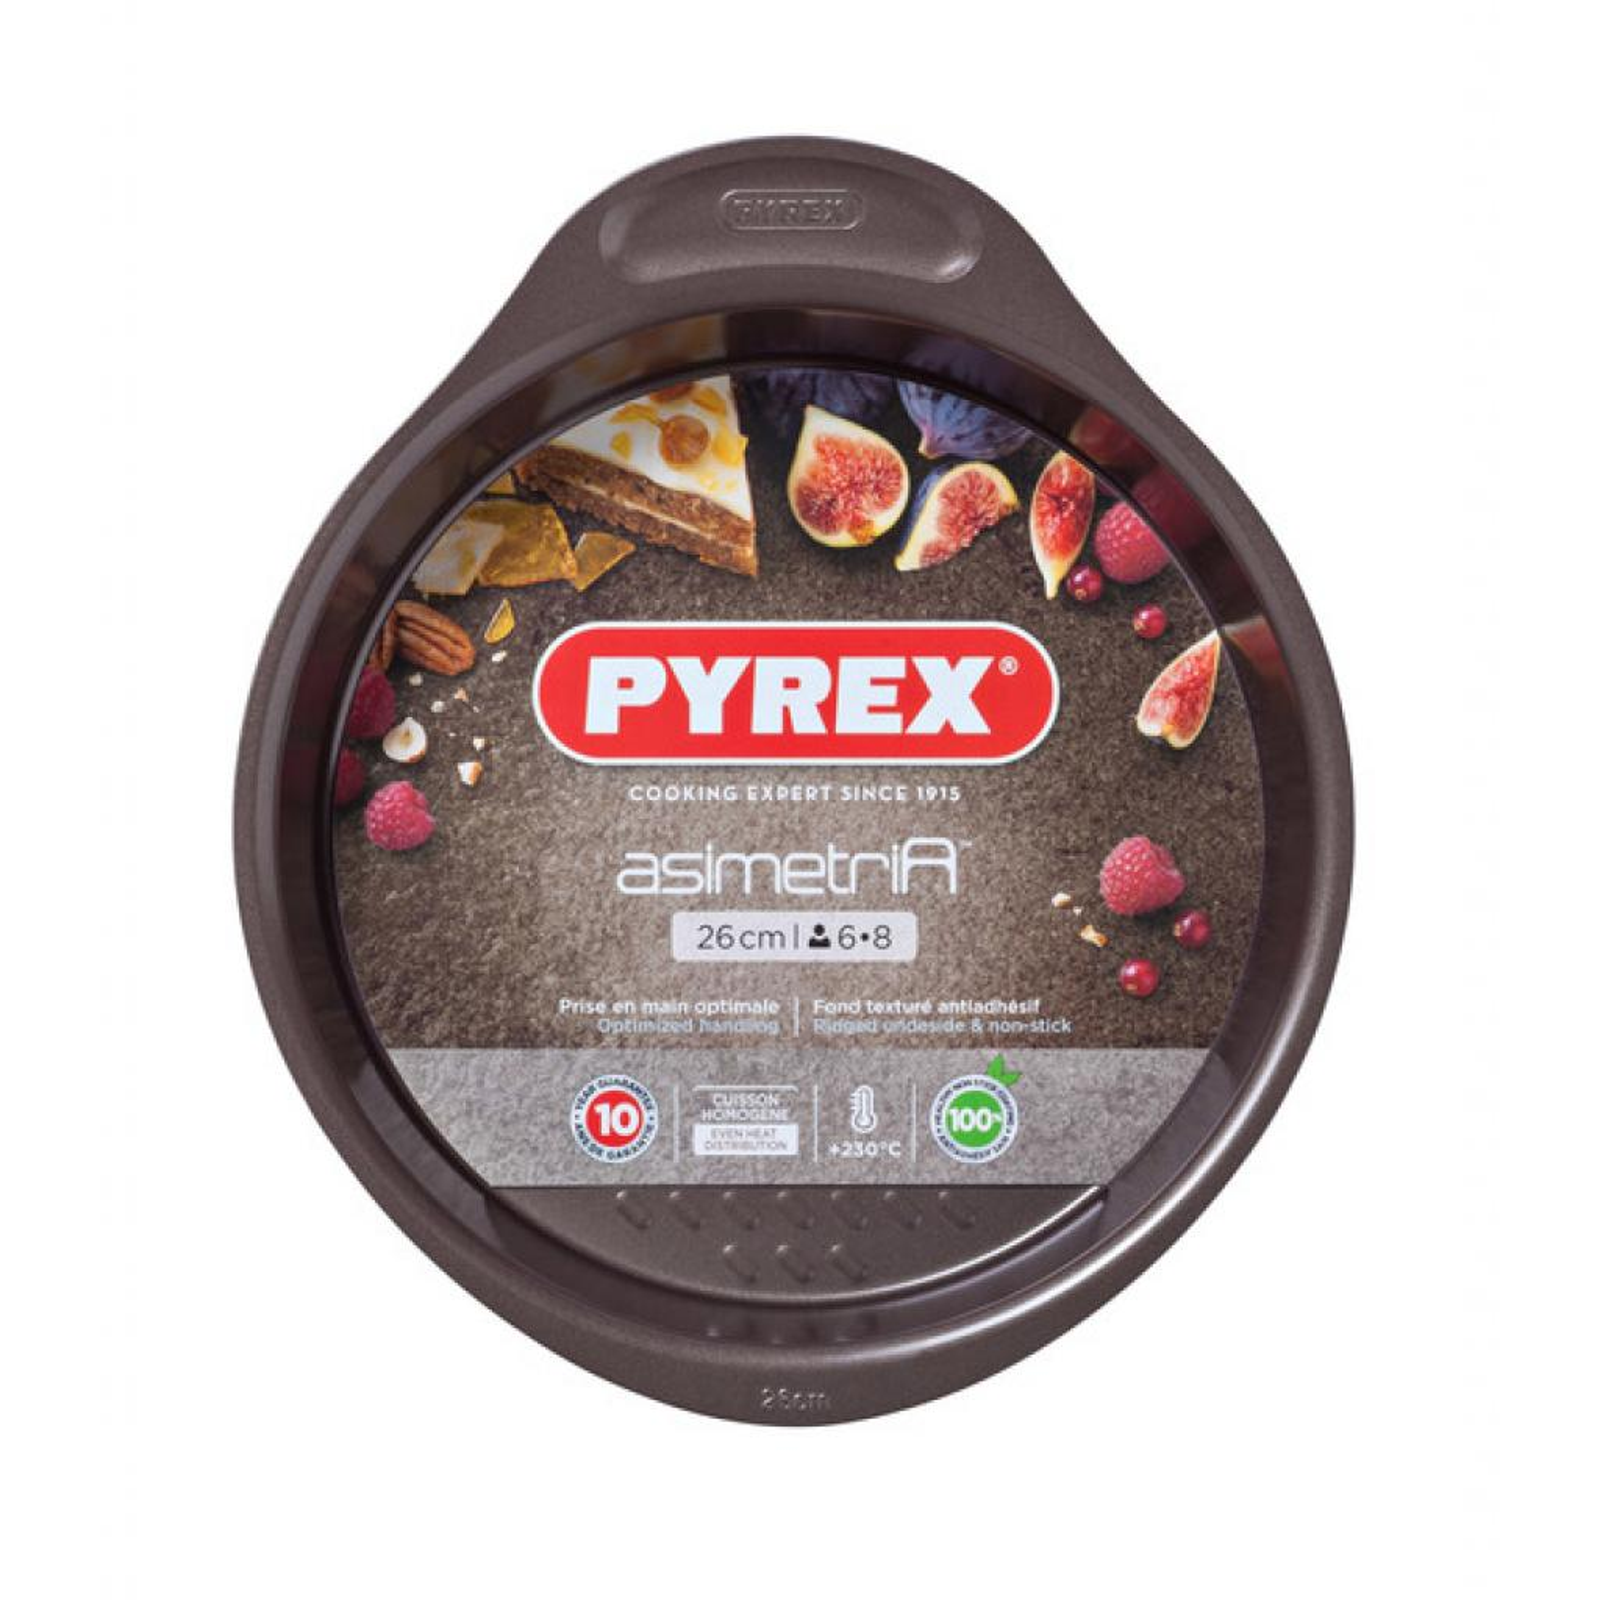 Форма для выпечки Pyrex Asimetria 26 см круглая (AS26BA0)